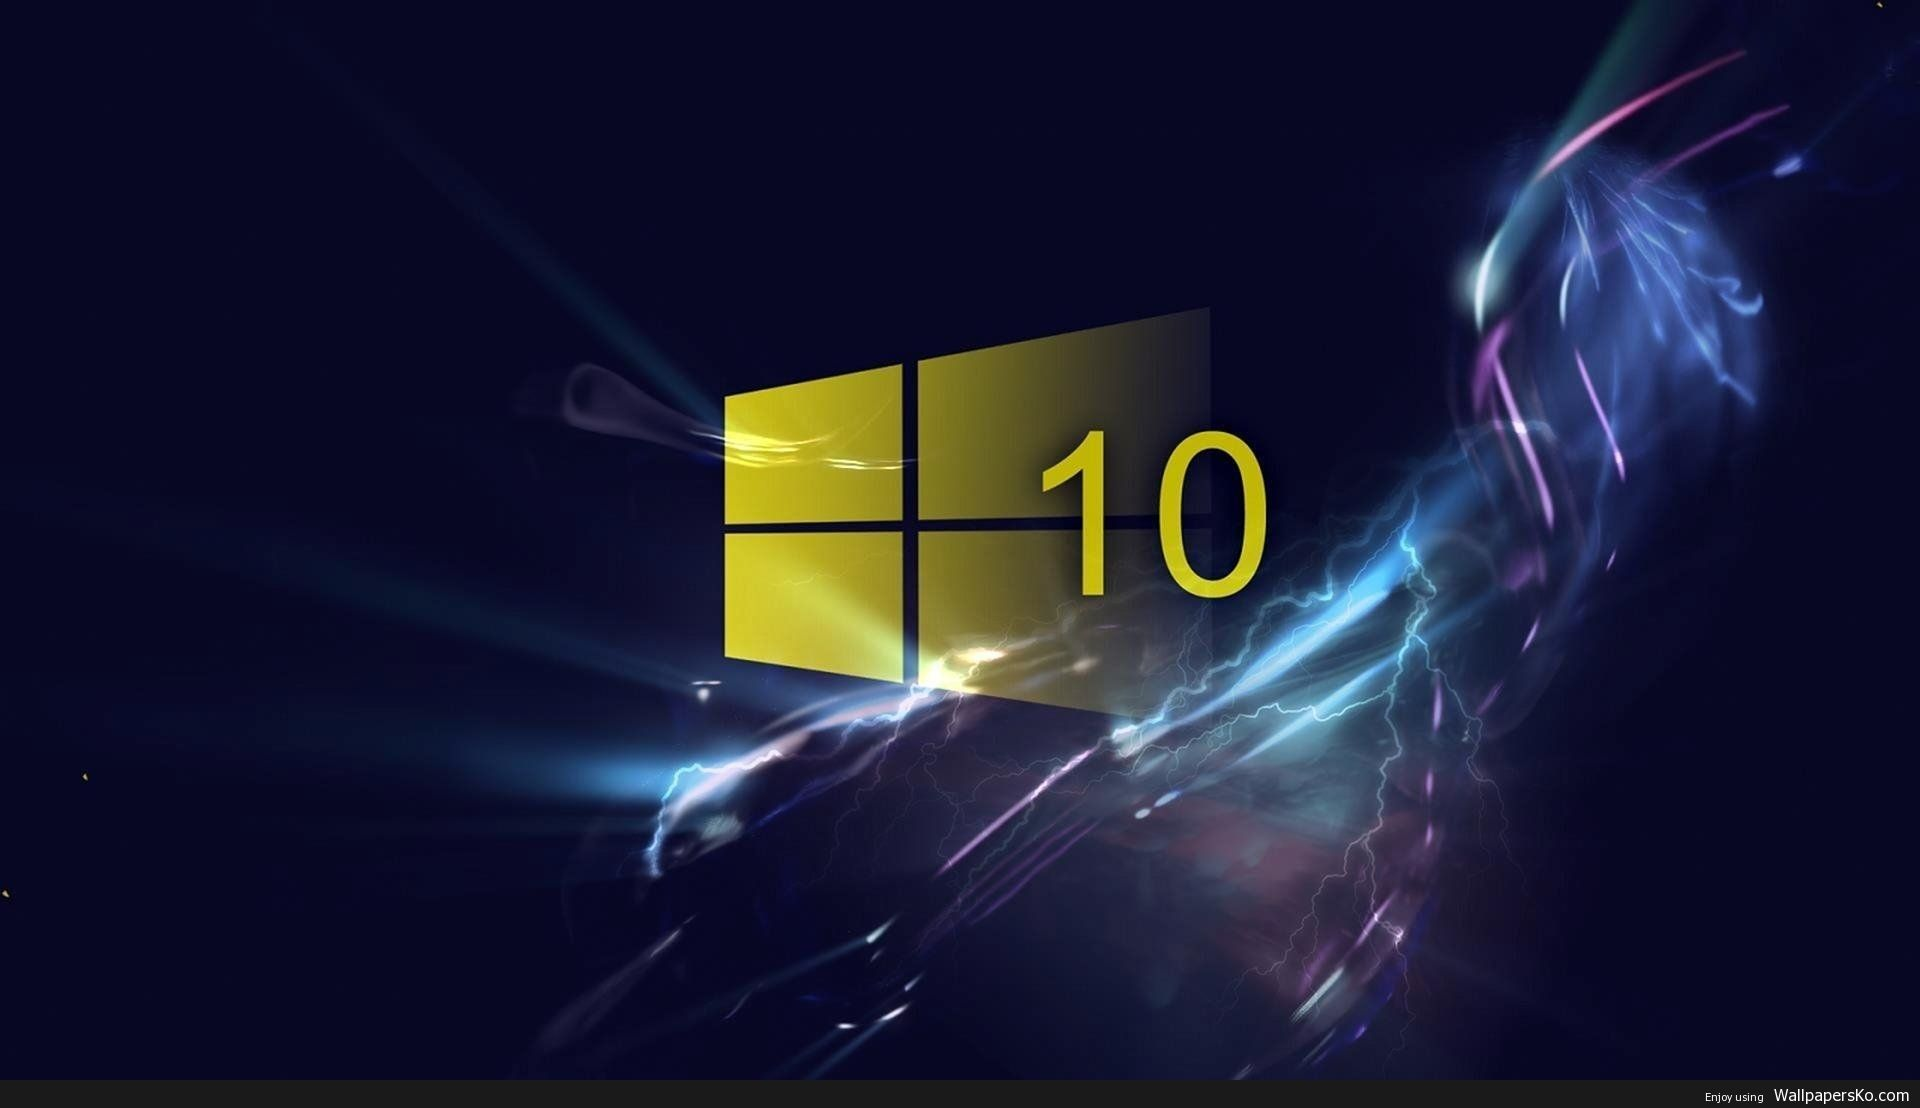 Hd Backgrounds For Windows 10 Http Wallpapersko Com Hd Backgrounds For Windows 10 Html Hd Wallpap Wallpaper Windows 10 Hd Wallpapers For Laptop Windows 10